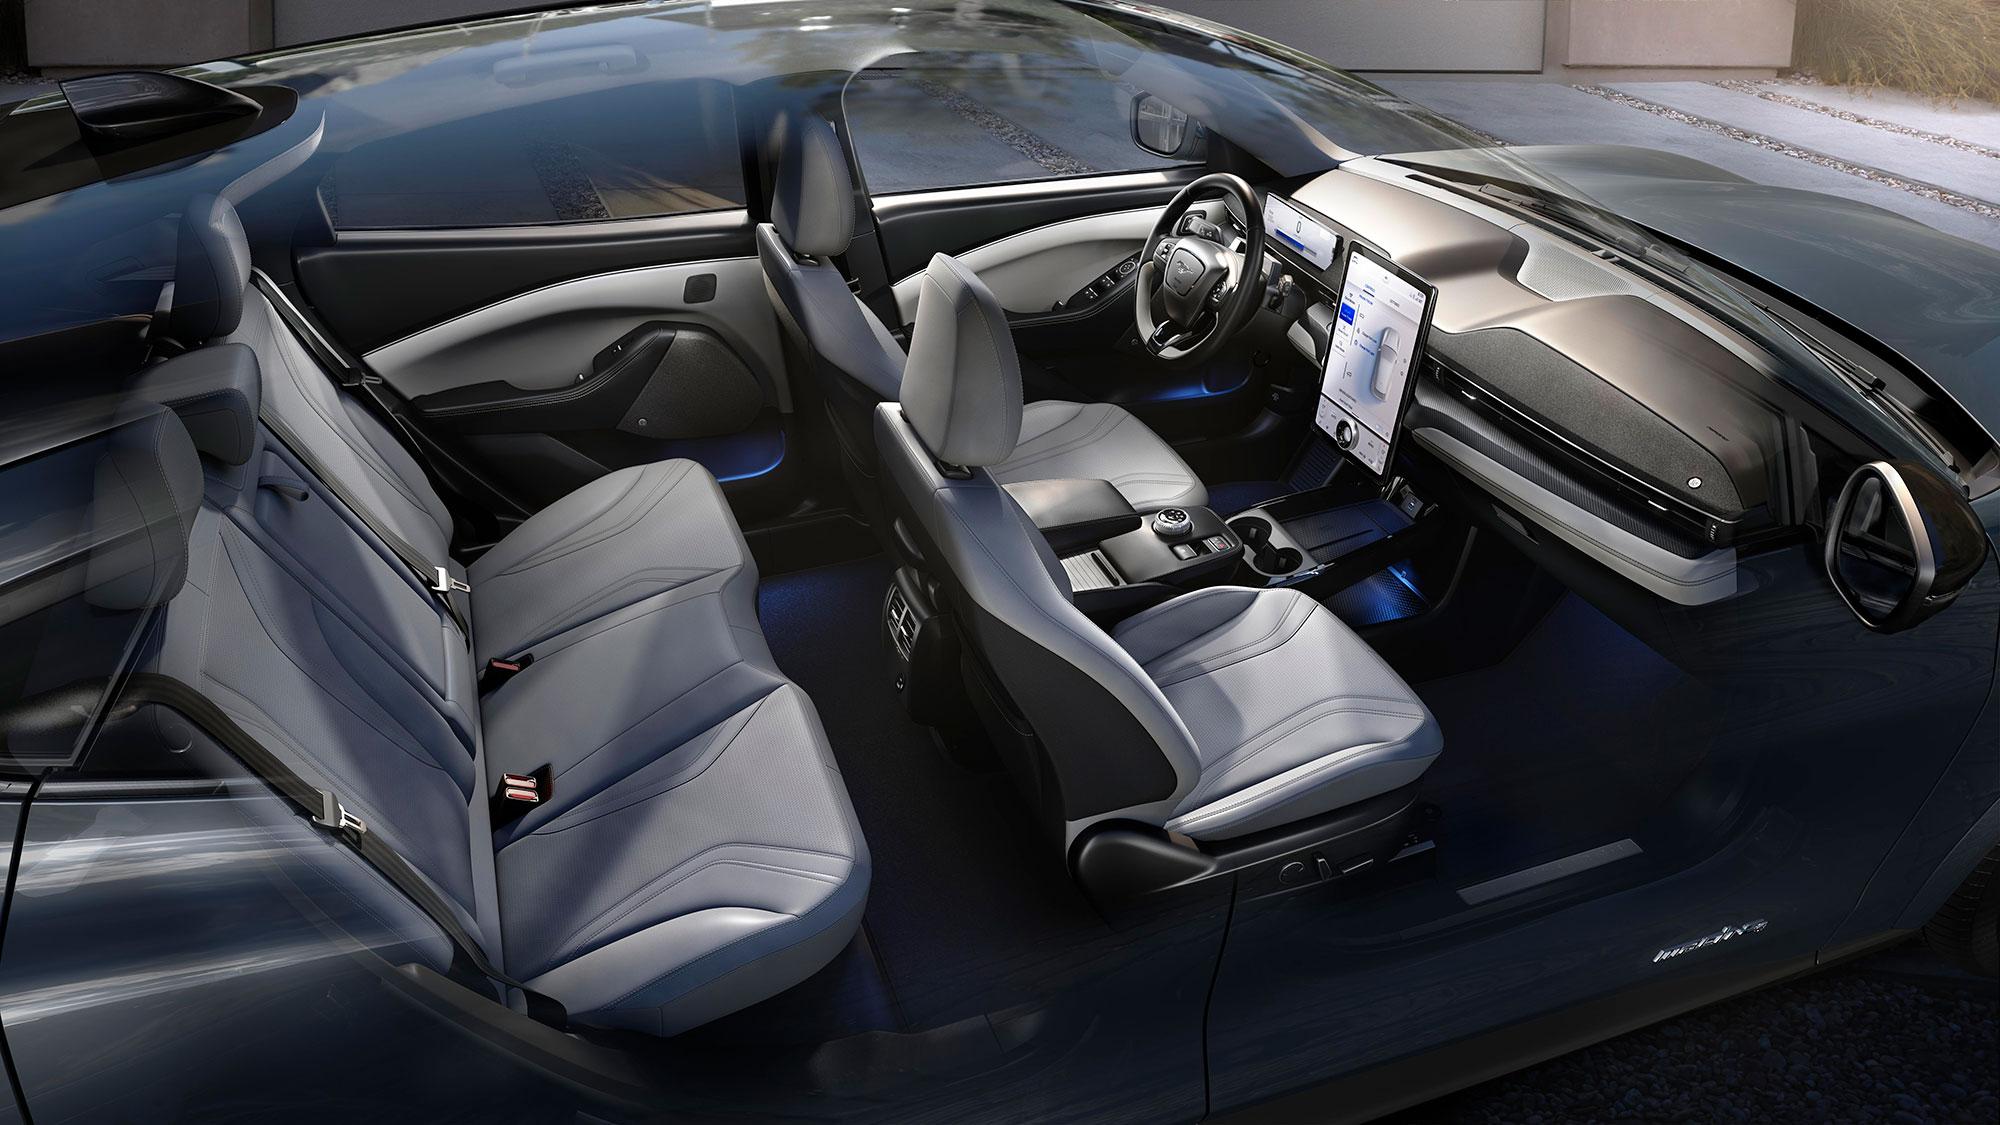 2021 Mustang Mach-e interior